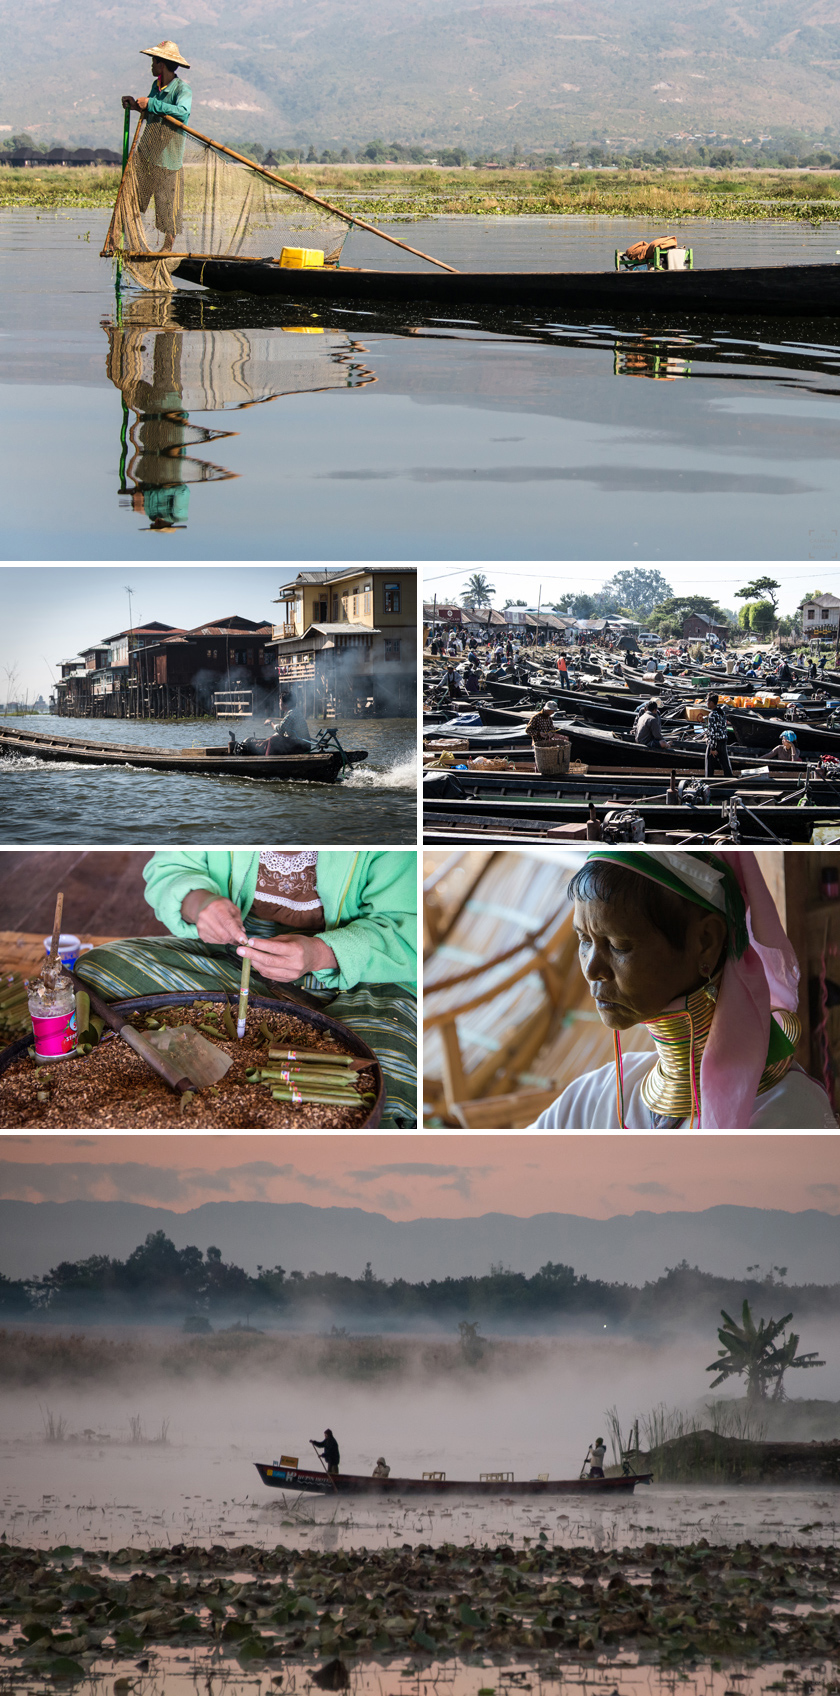 Burma resa, Inle lake, marknad